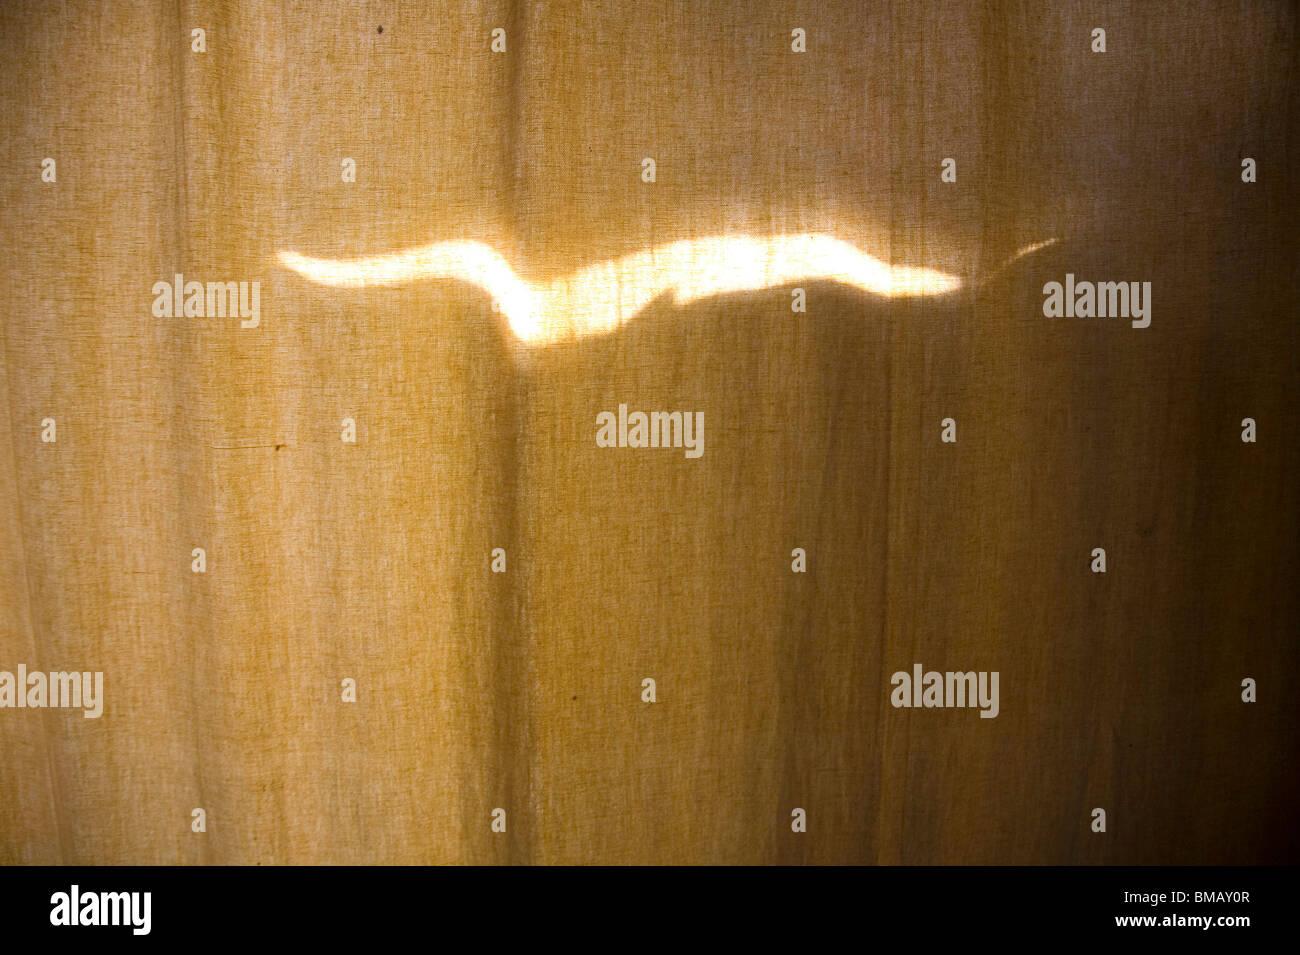 Light bird shape art on brown background ; Dhaka ; Bangladesh - Stock Image